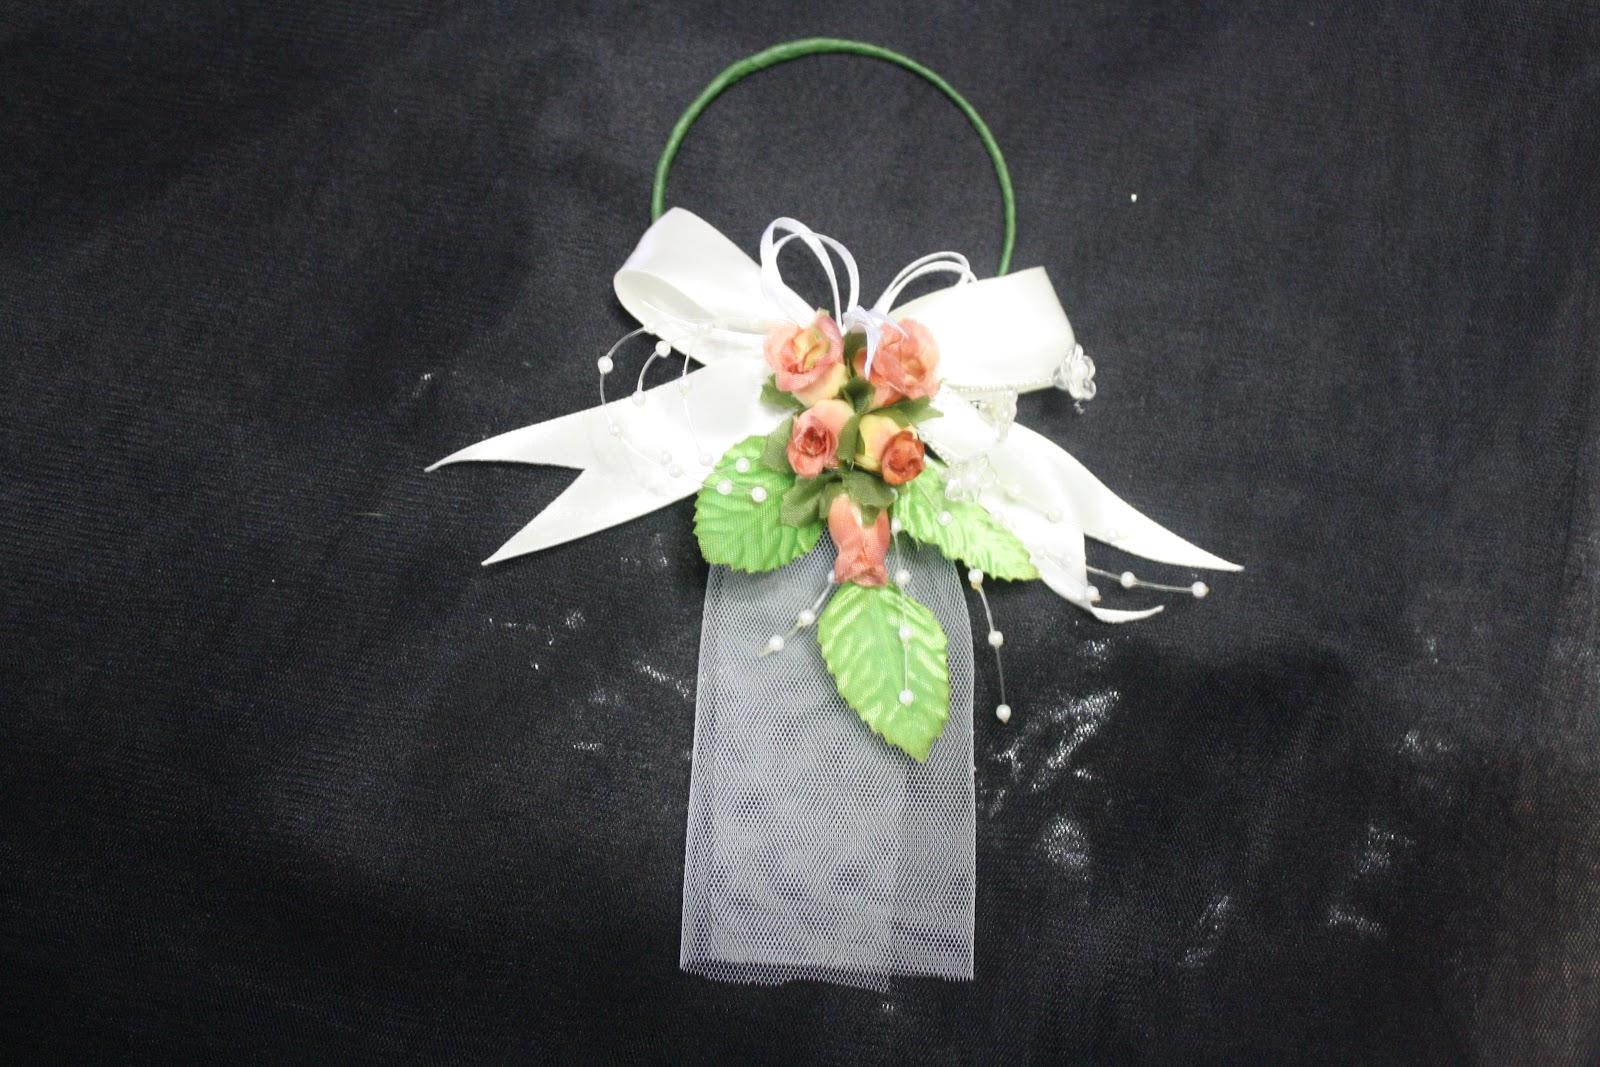 hantaran eksklusif jie u0026 39 s collection  colourful bunga gantung